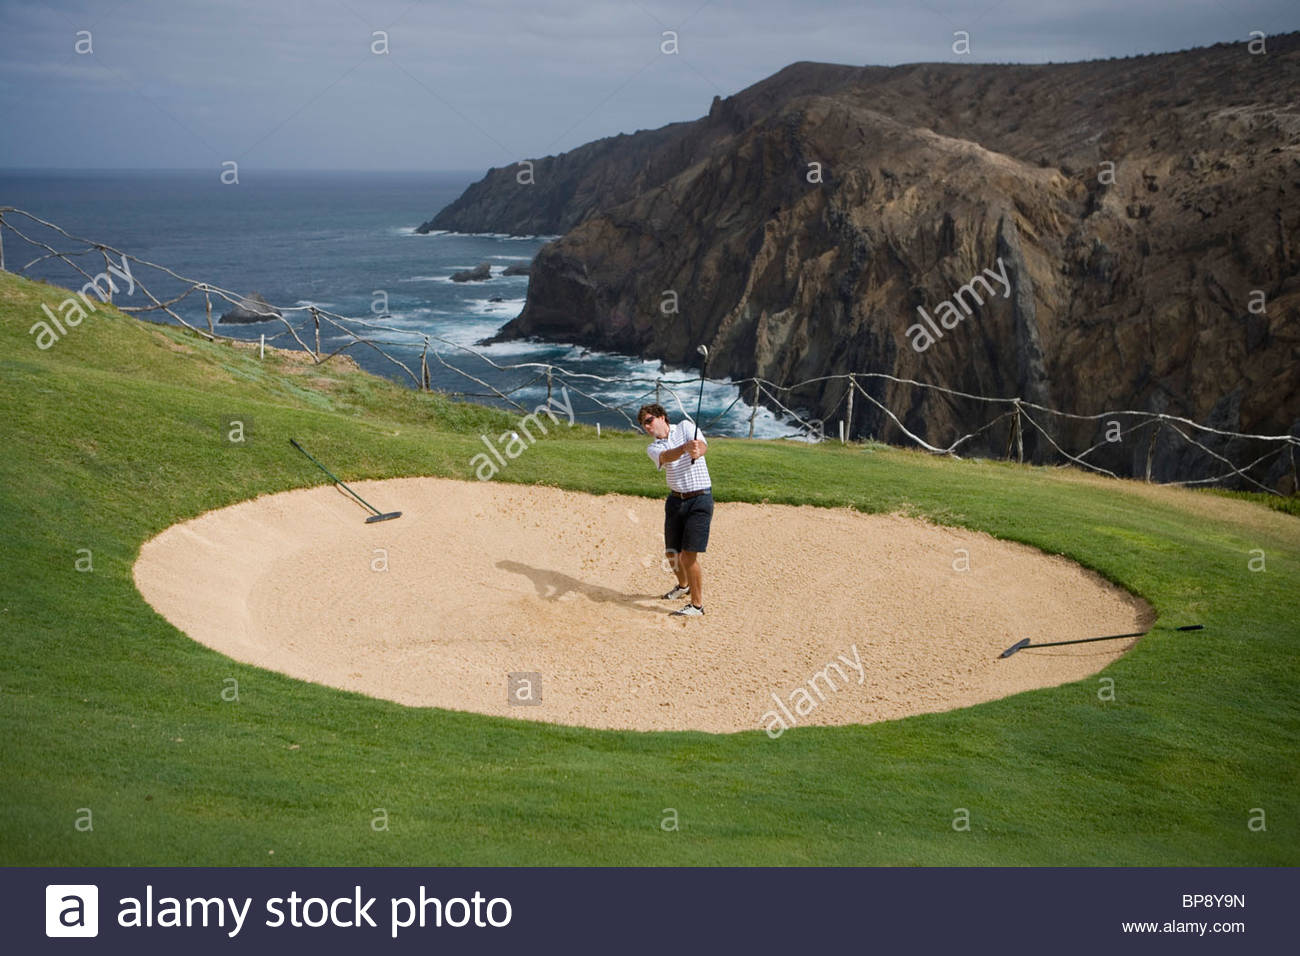 Golfer chips ball from sandtrap of hole 13 at Porto Santo Golfe Golf Course, Porto Santo, near Madeira, Portugal - Stock Image